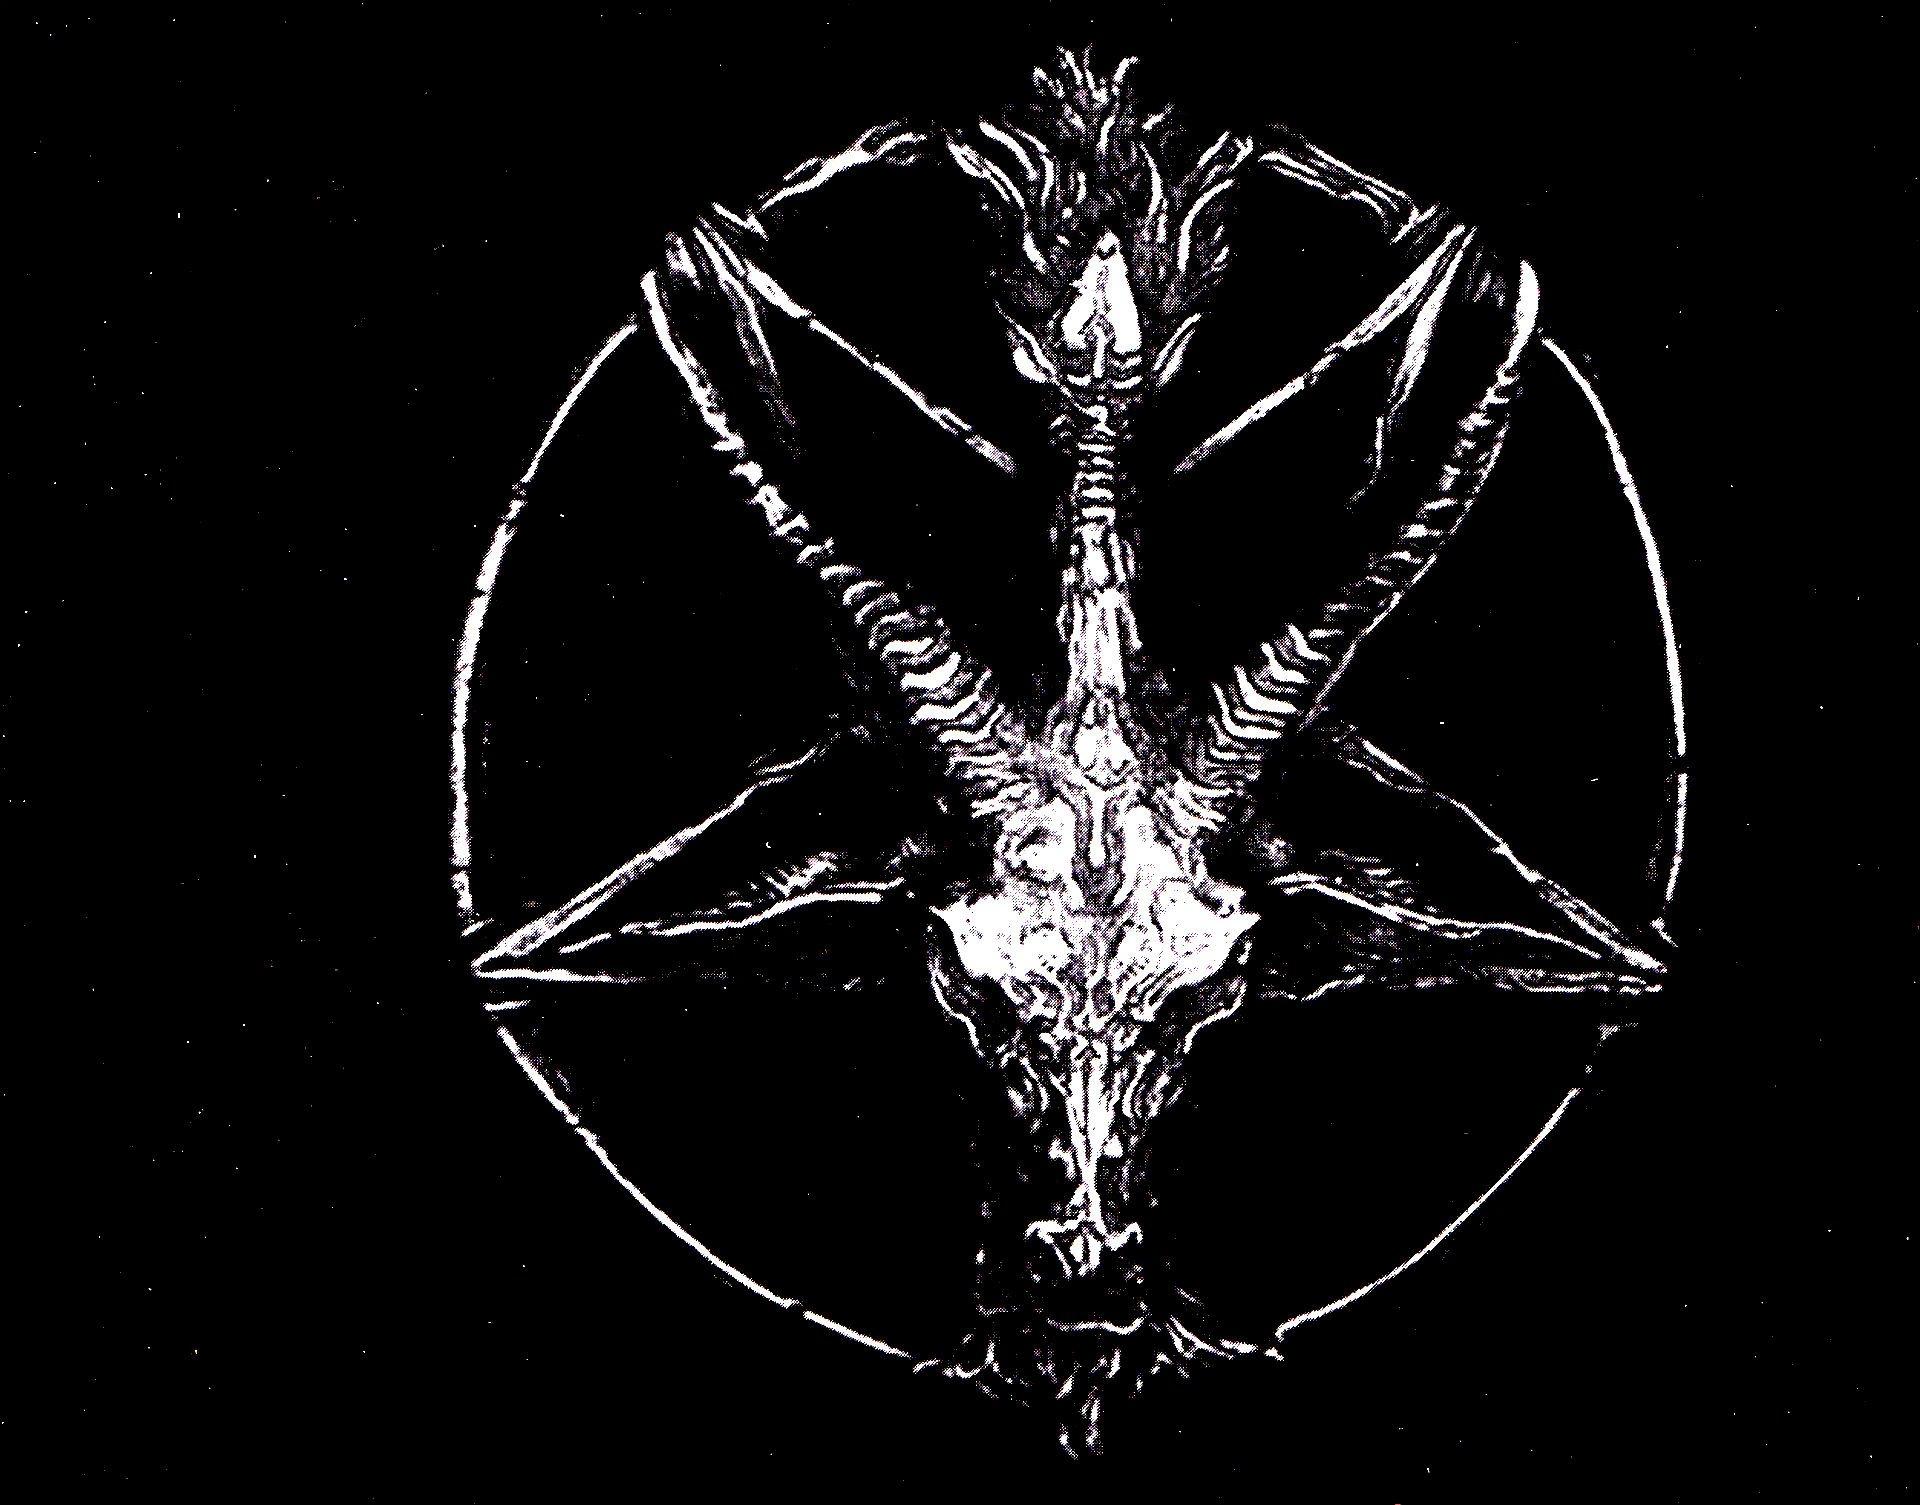 Fallen angel heavy metal porn music video 5